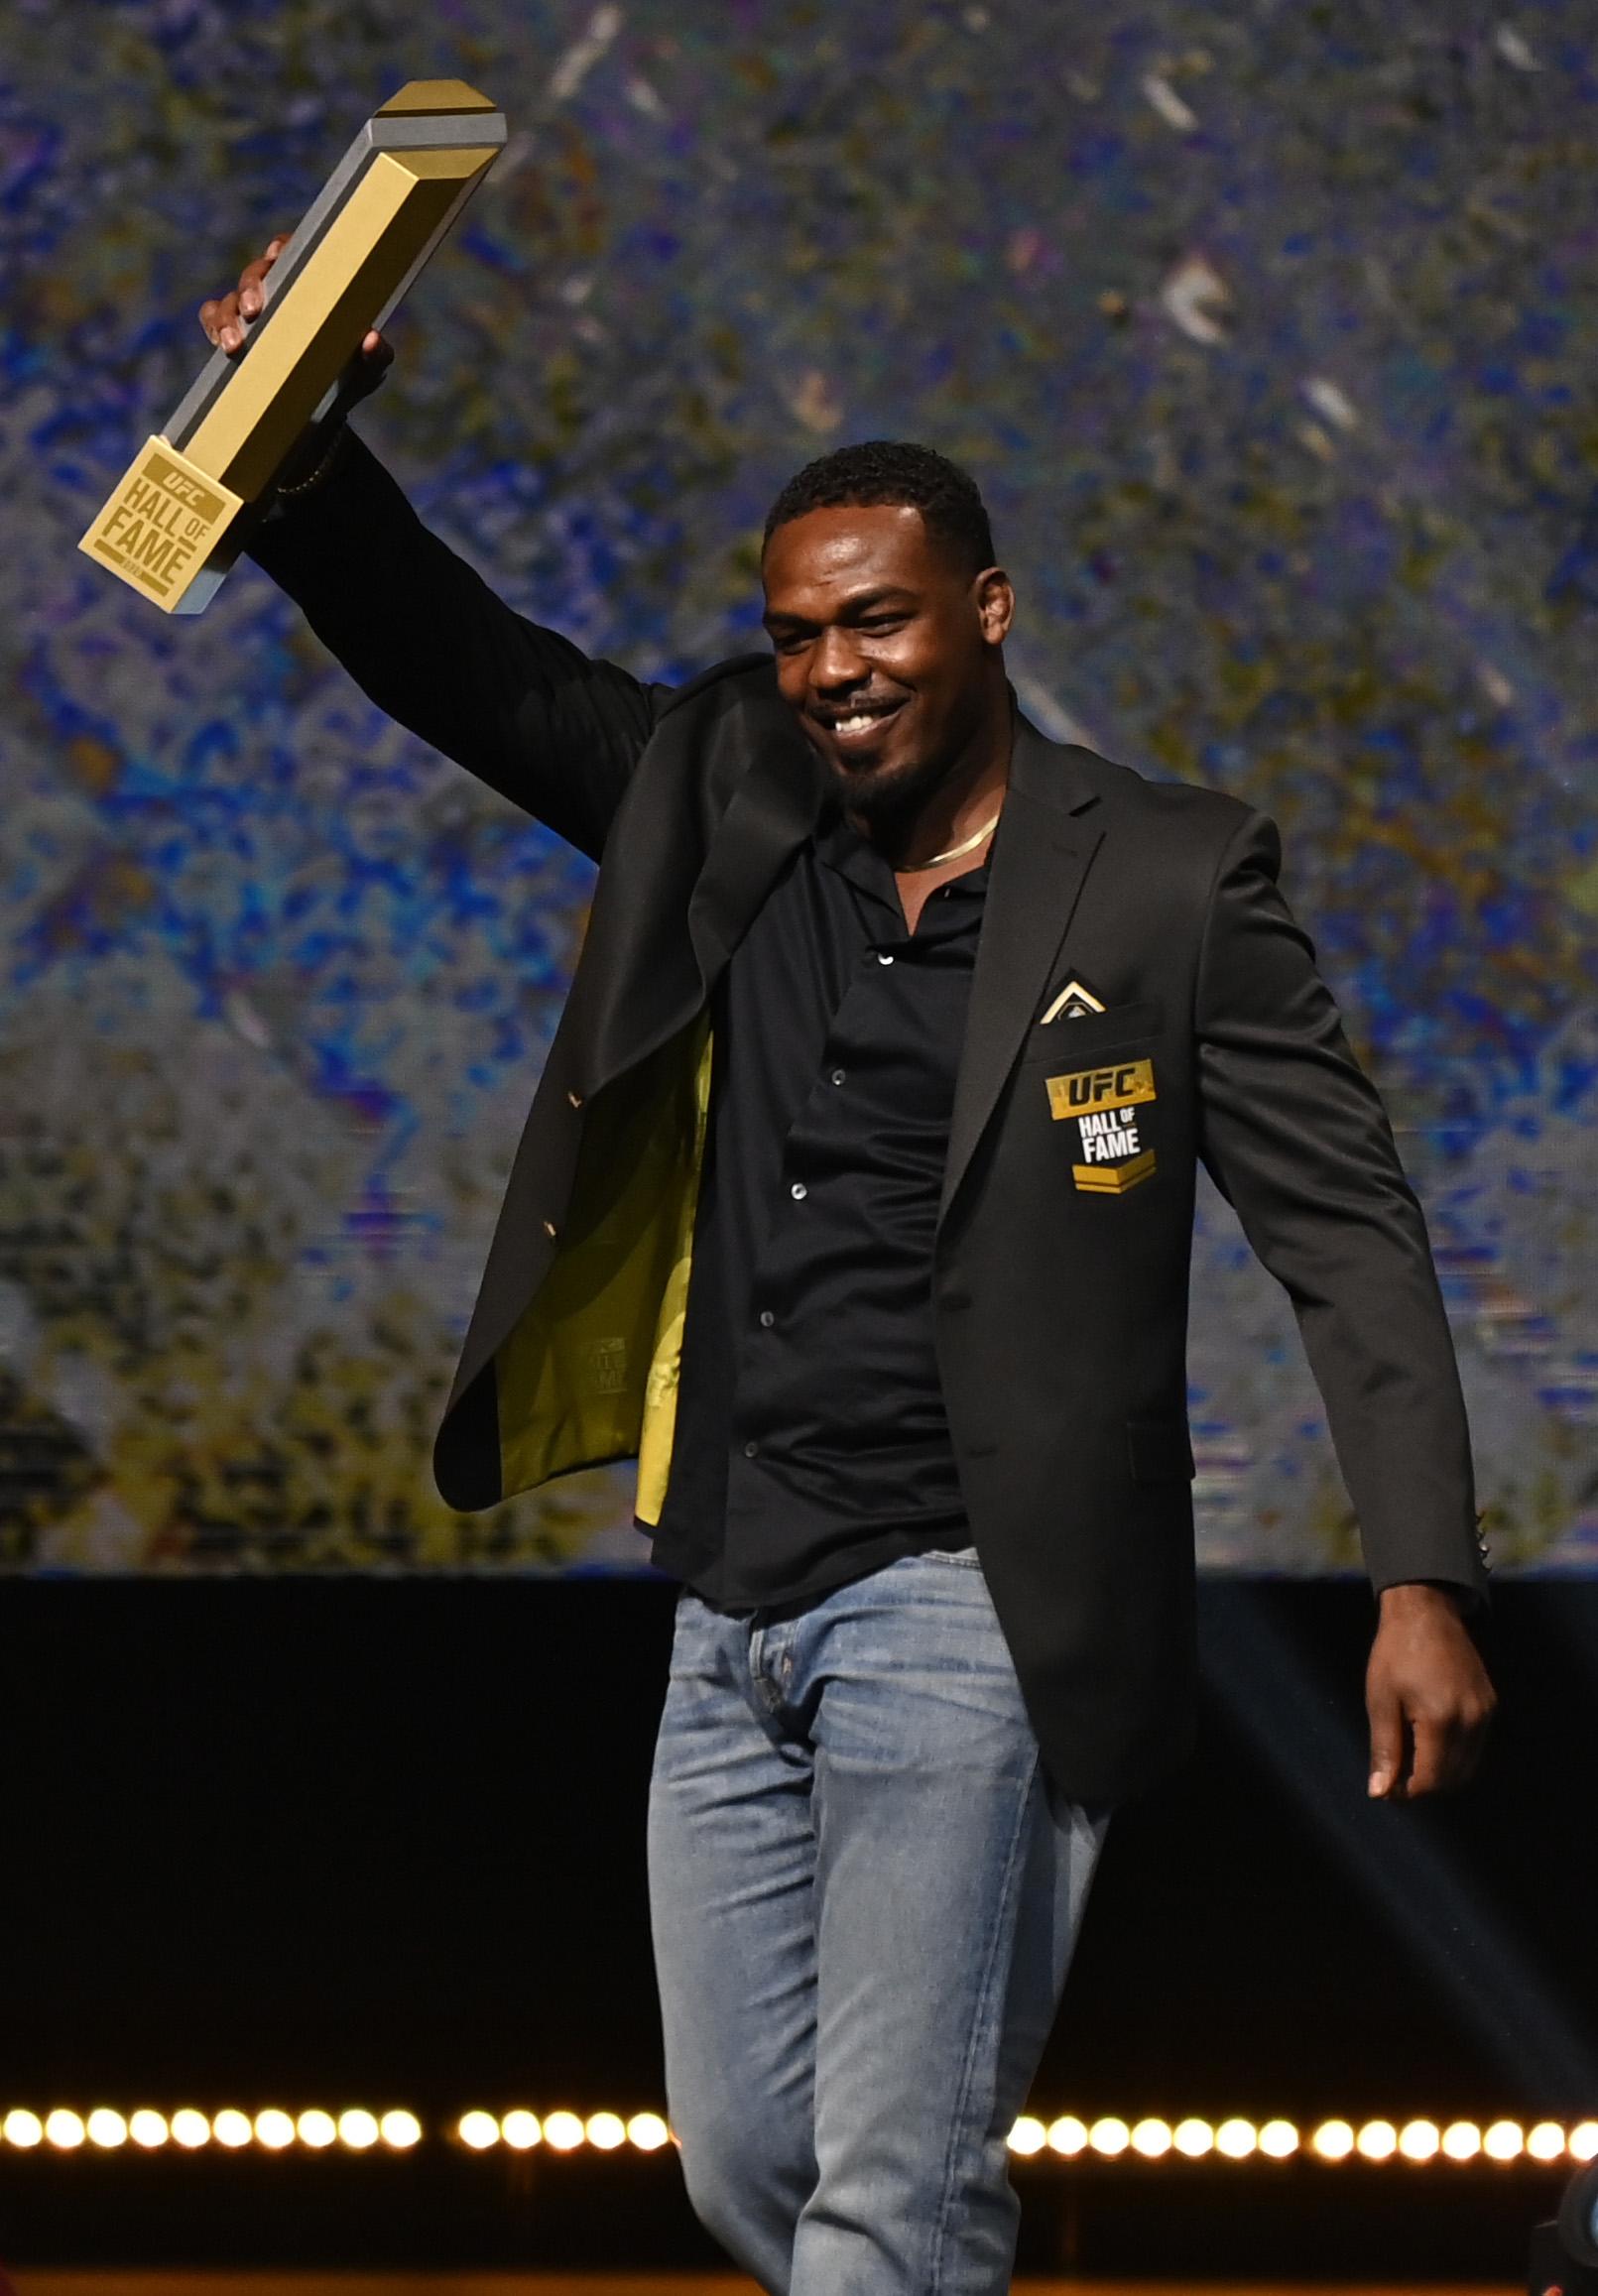 UFC Hall of Fame Class of 2020 Induction Ceremony - Jon Jones